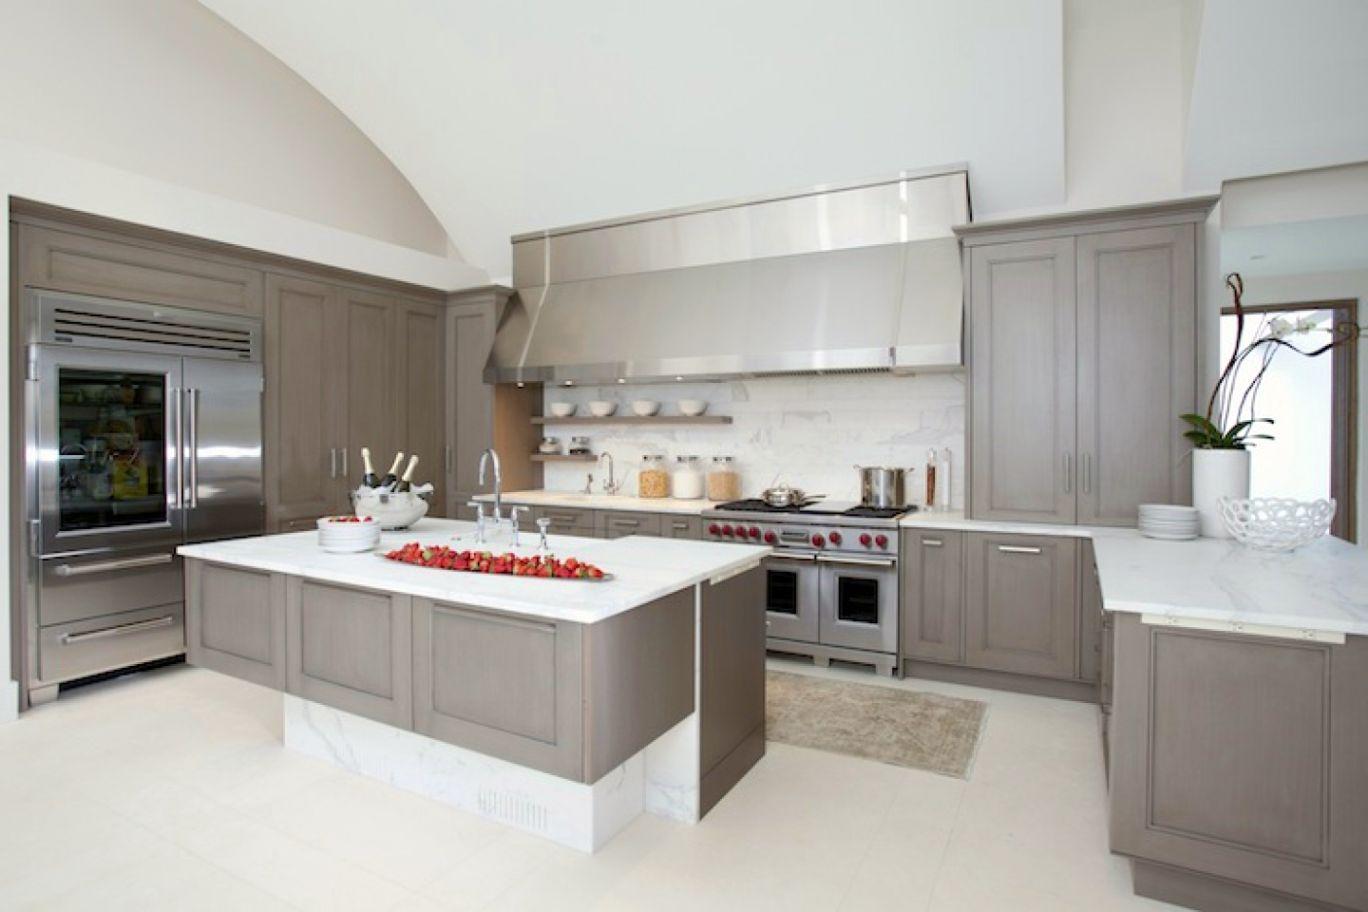 Kitchen White Cabinets Grey Countertop Photo 9